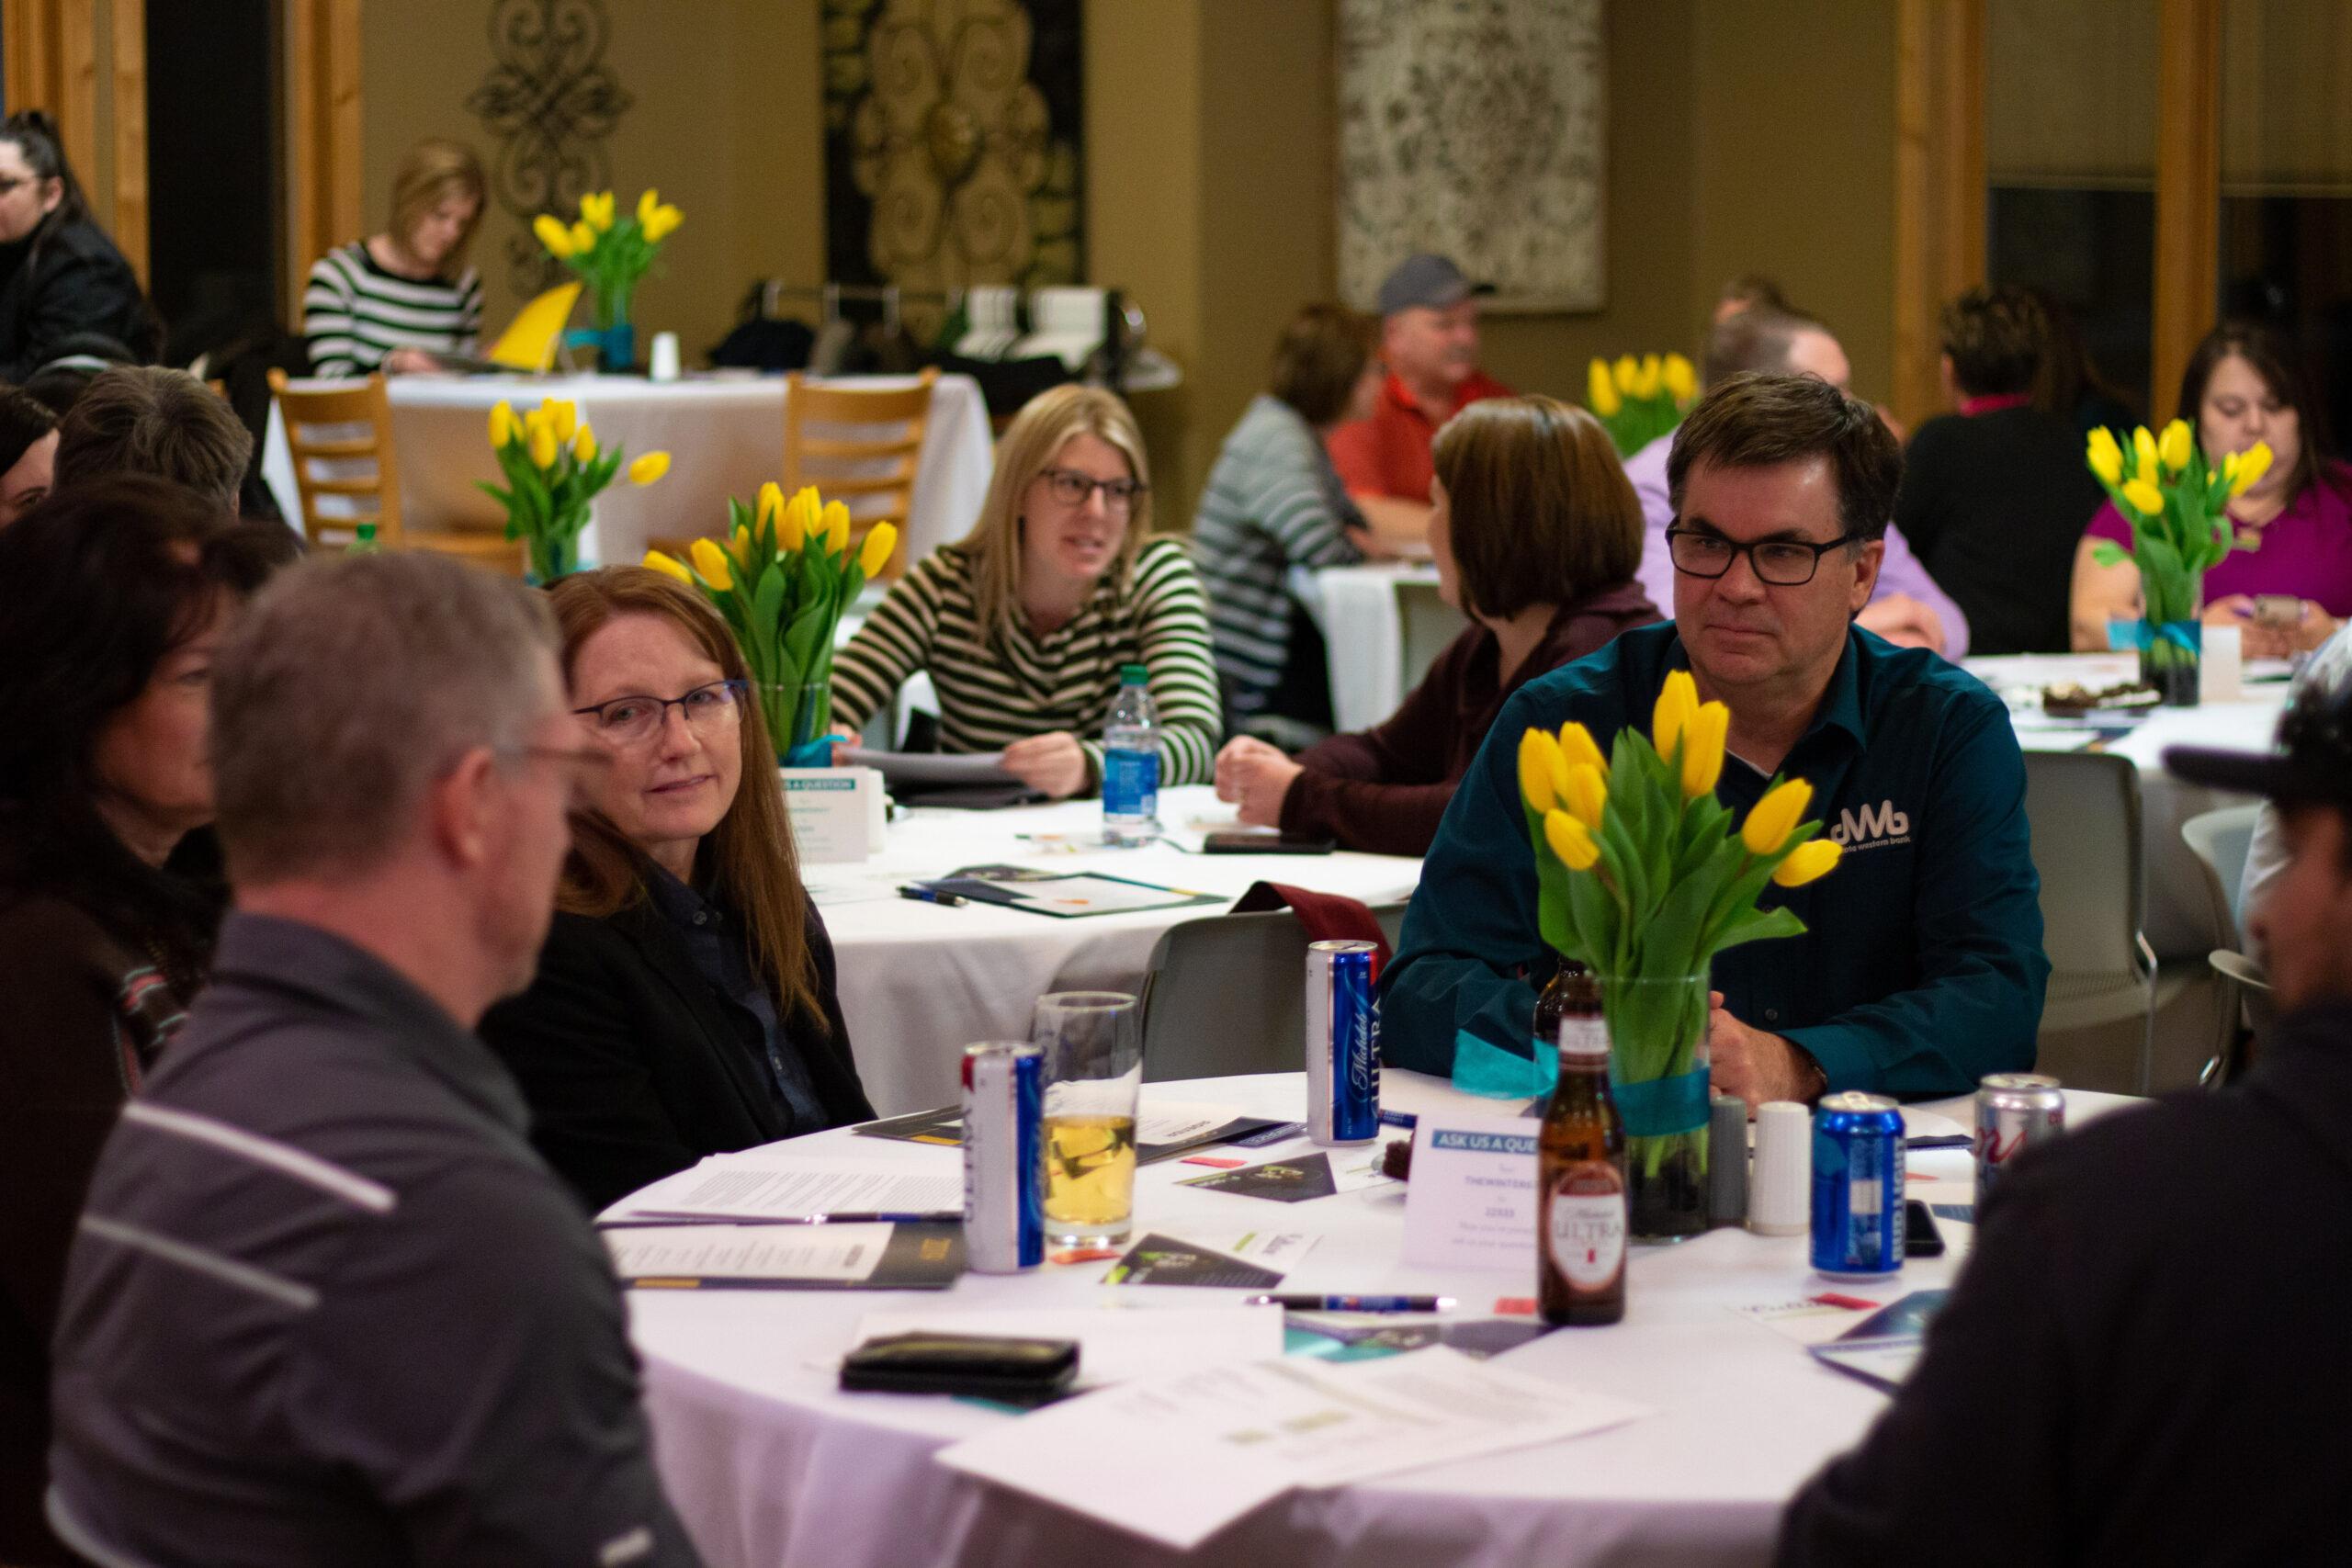 2019 Bowman County Development Corporation Annual Meeting